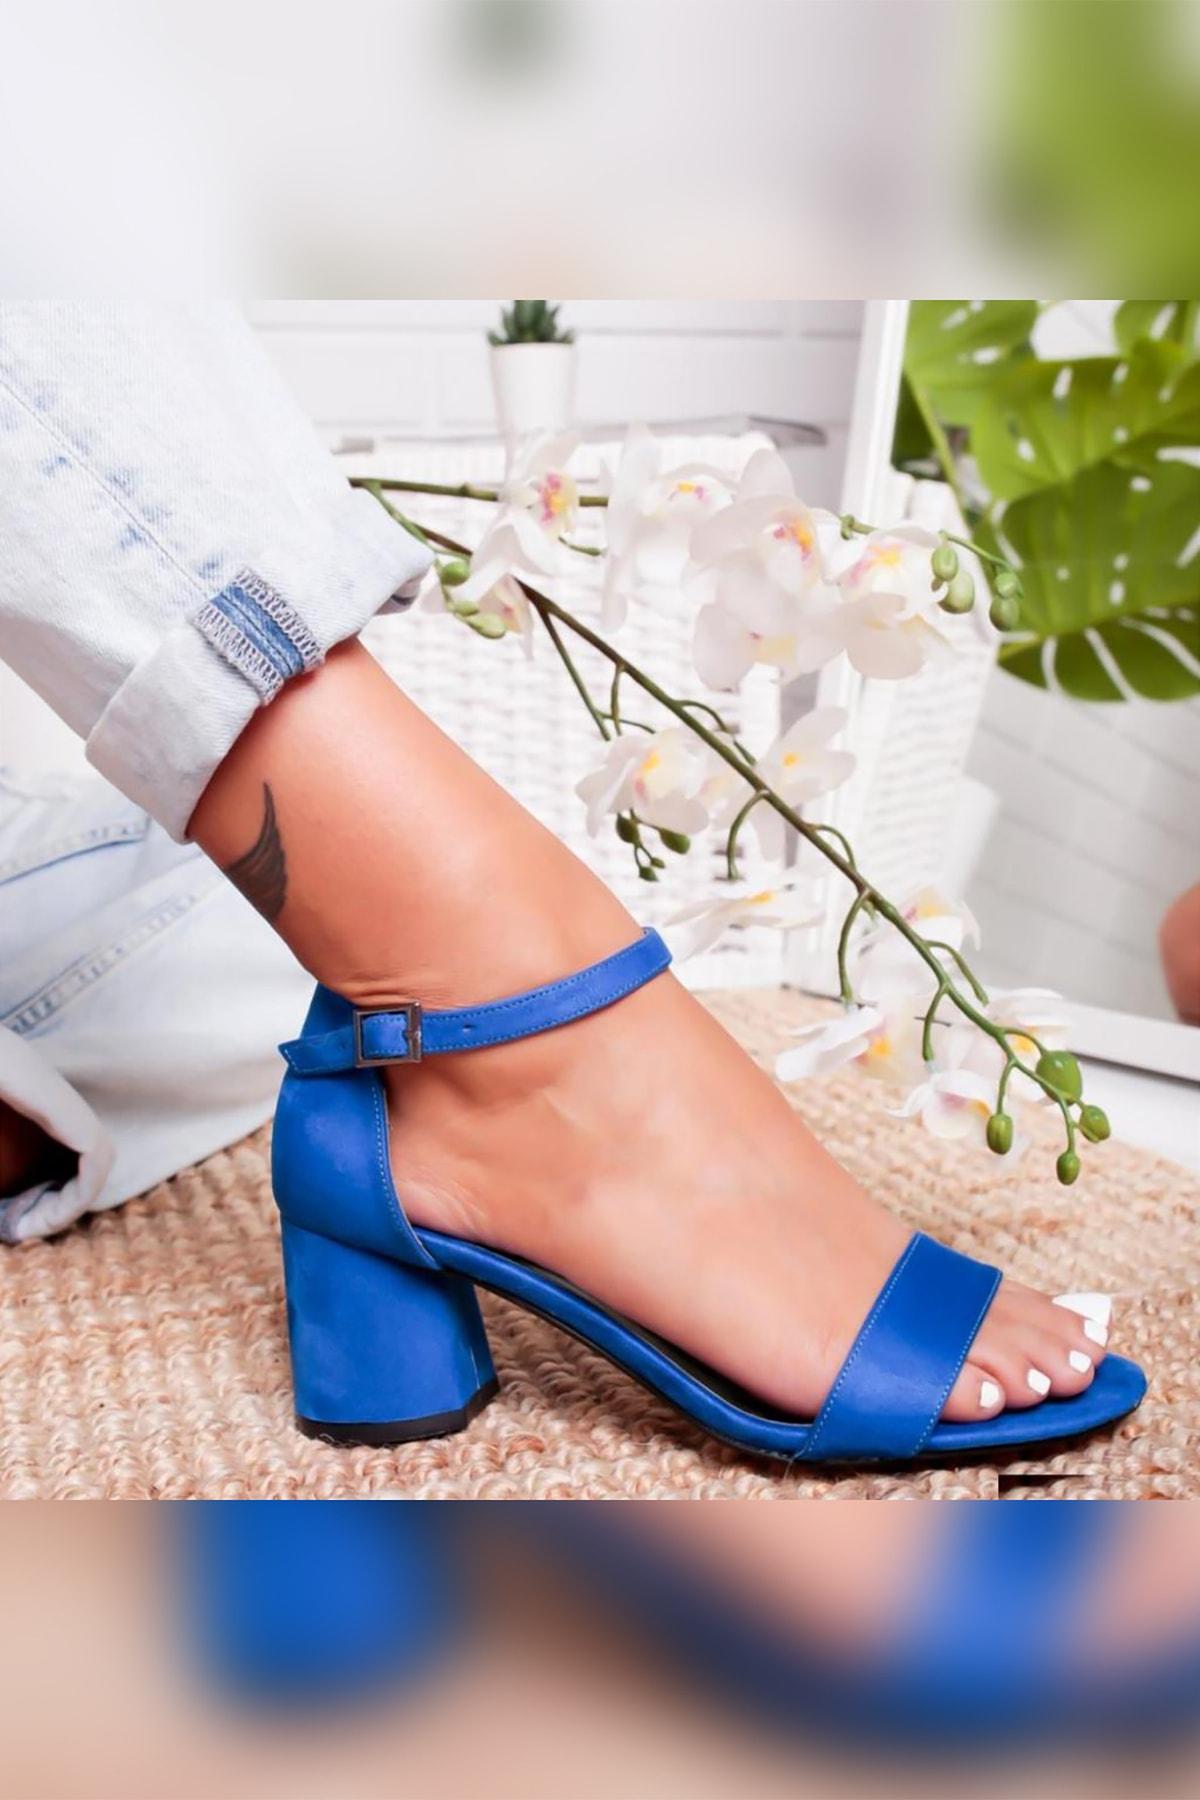 Limoya Averi Sax Süet 6cm Topuklu Tek Bantlı Sandalet 2